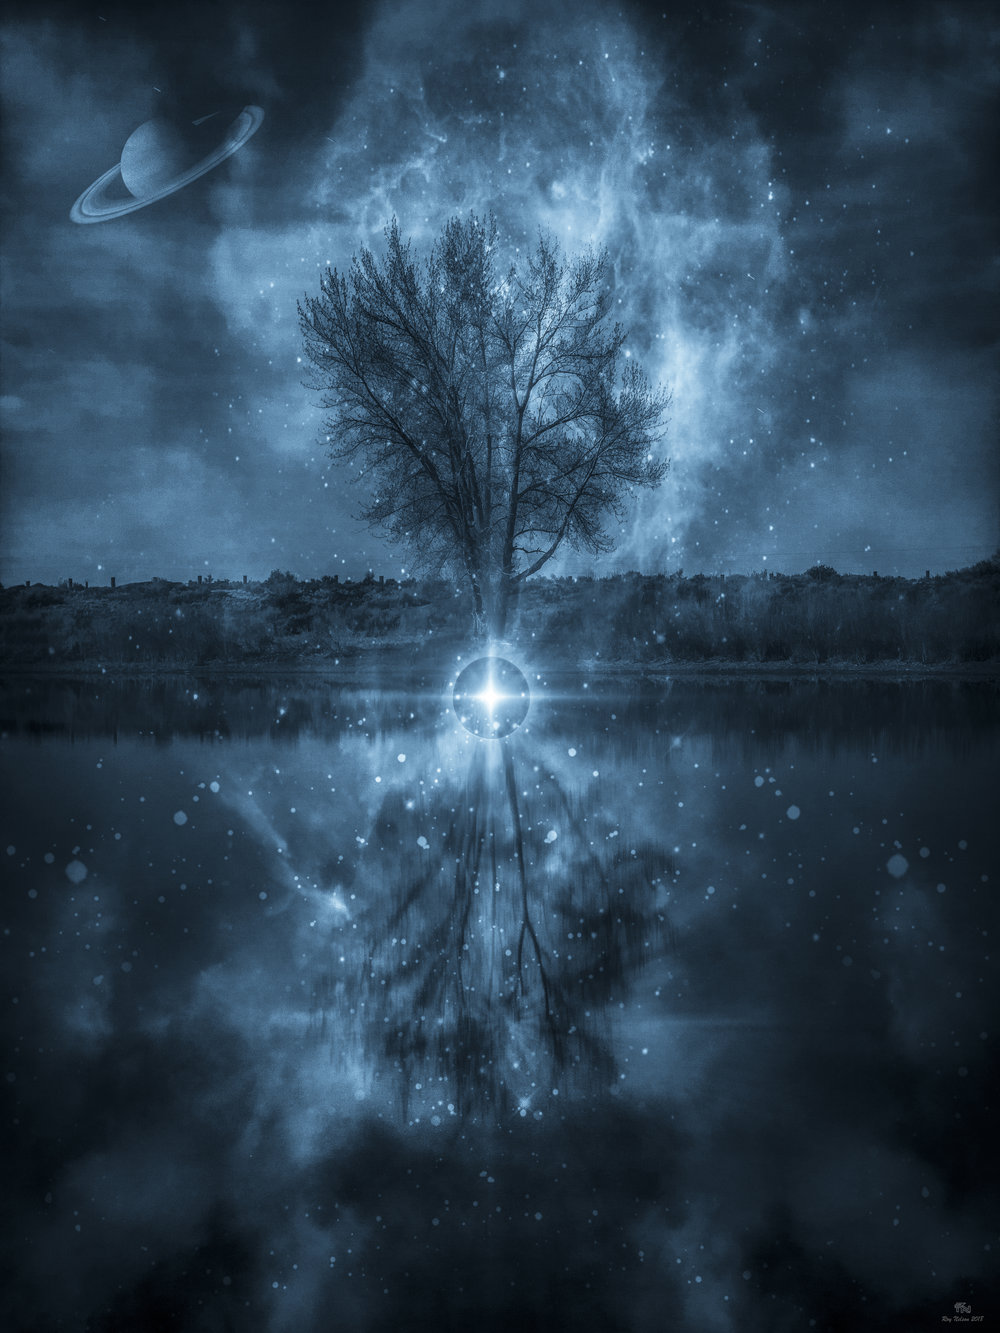 Lost+Under+Different+Skies_+Blue+Edition.jpg